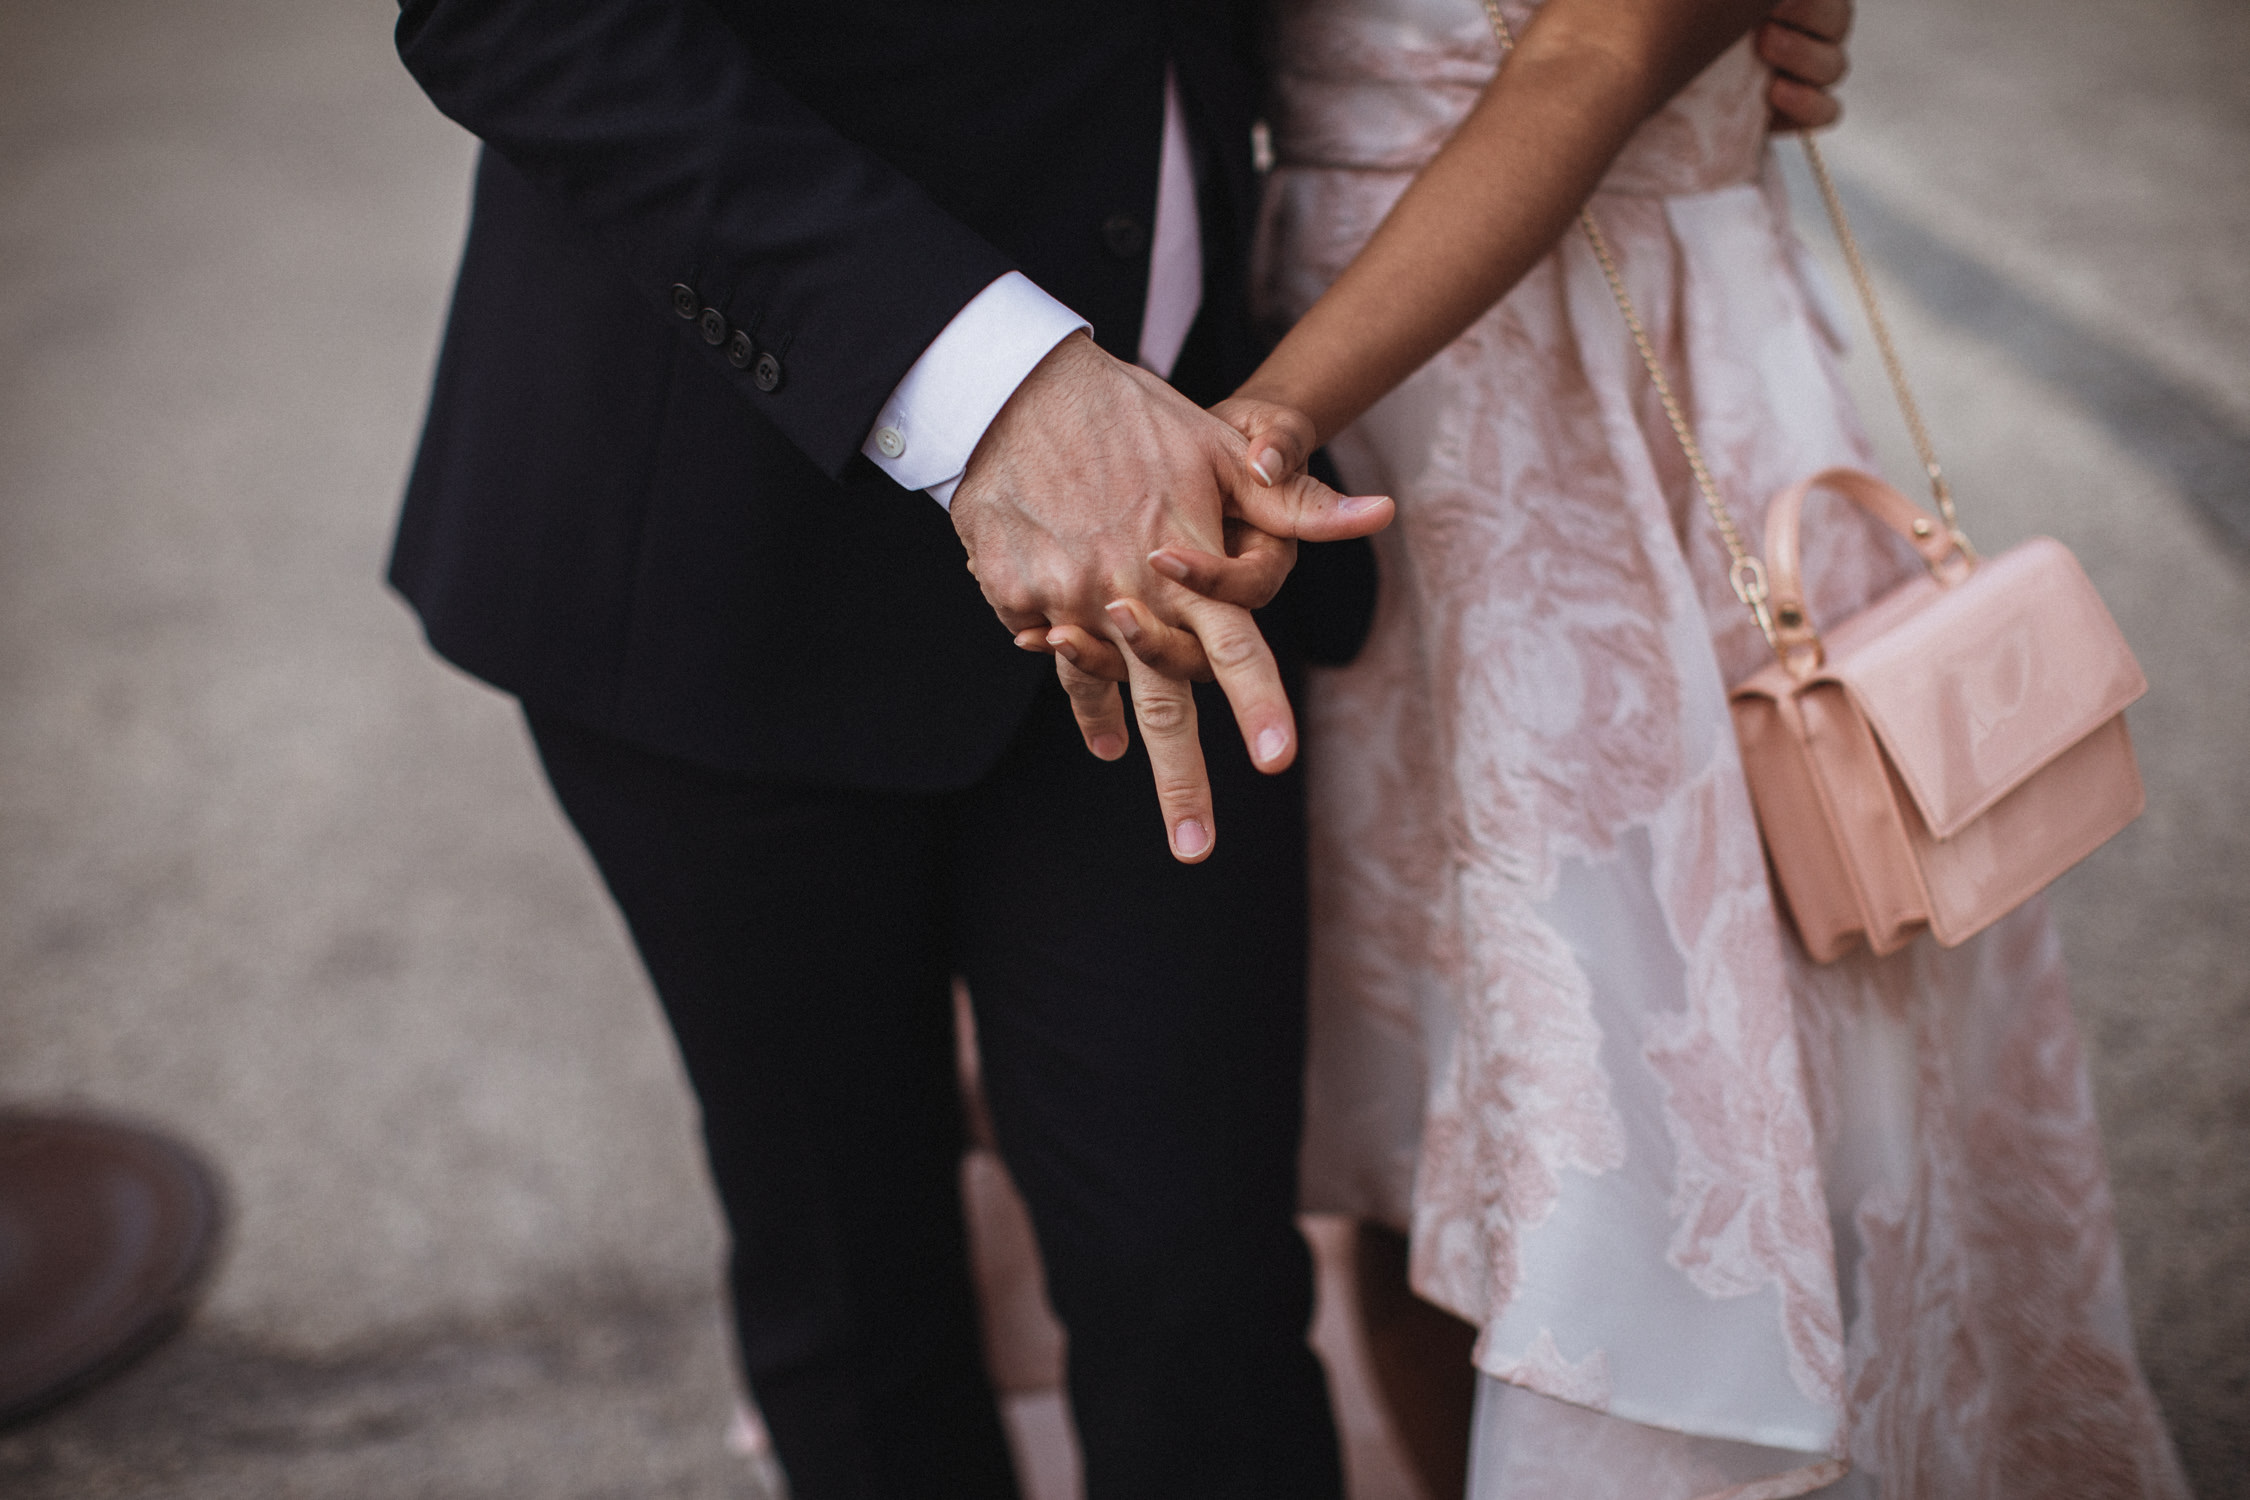 Brooklyn Wedding Photos DUMBO jose melgarejo 2